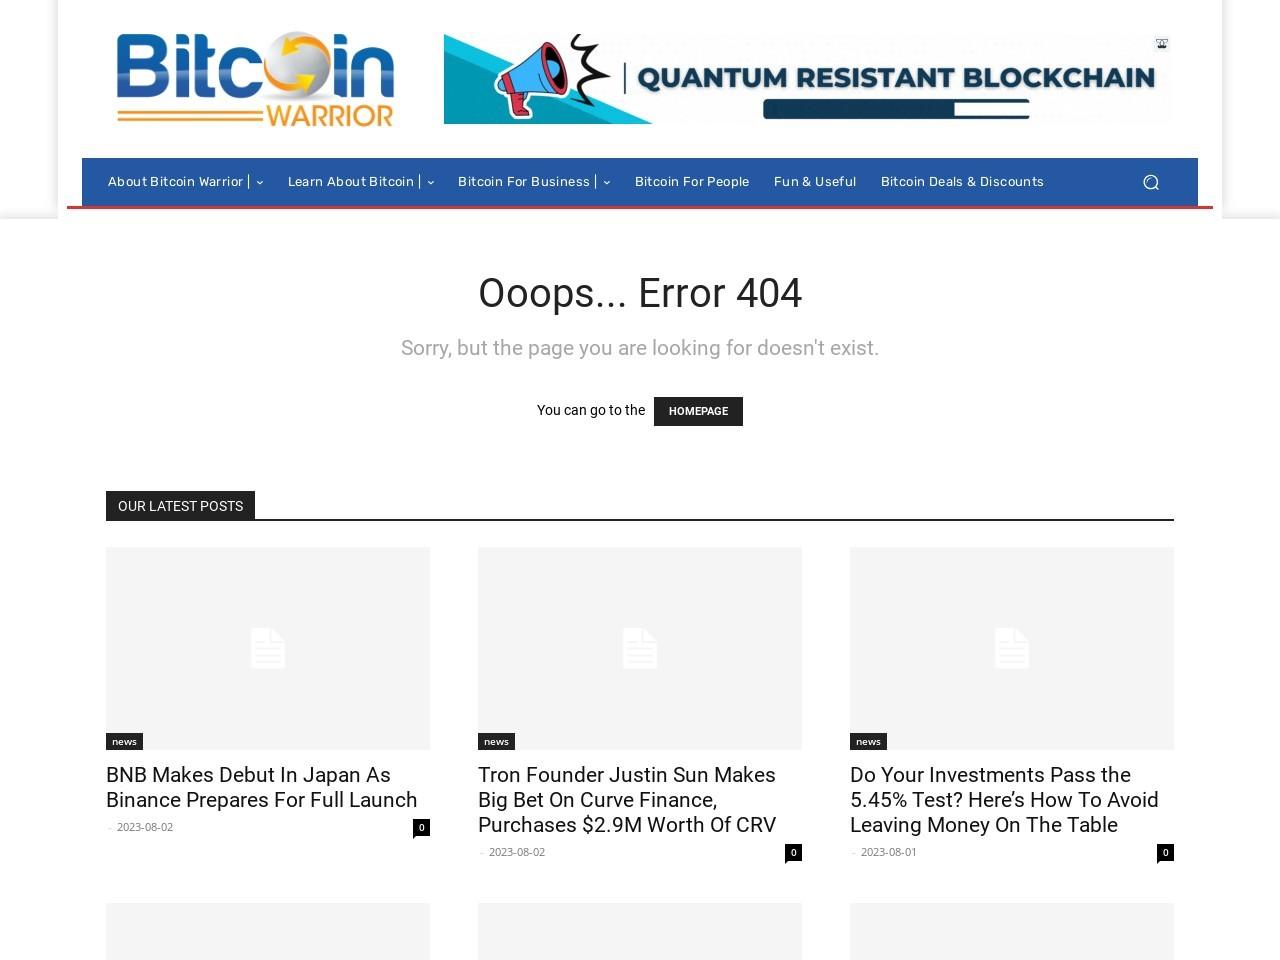 Guggenheim Partners' Scott Minerd Predicts Bitcoin Price Could Retrace to $20,000